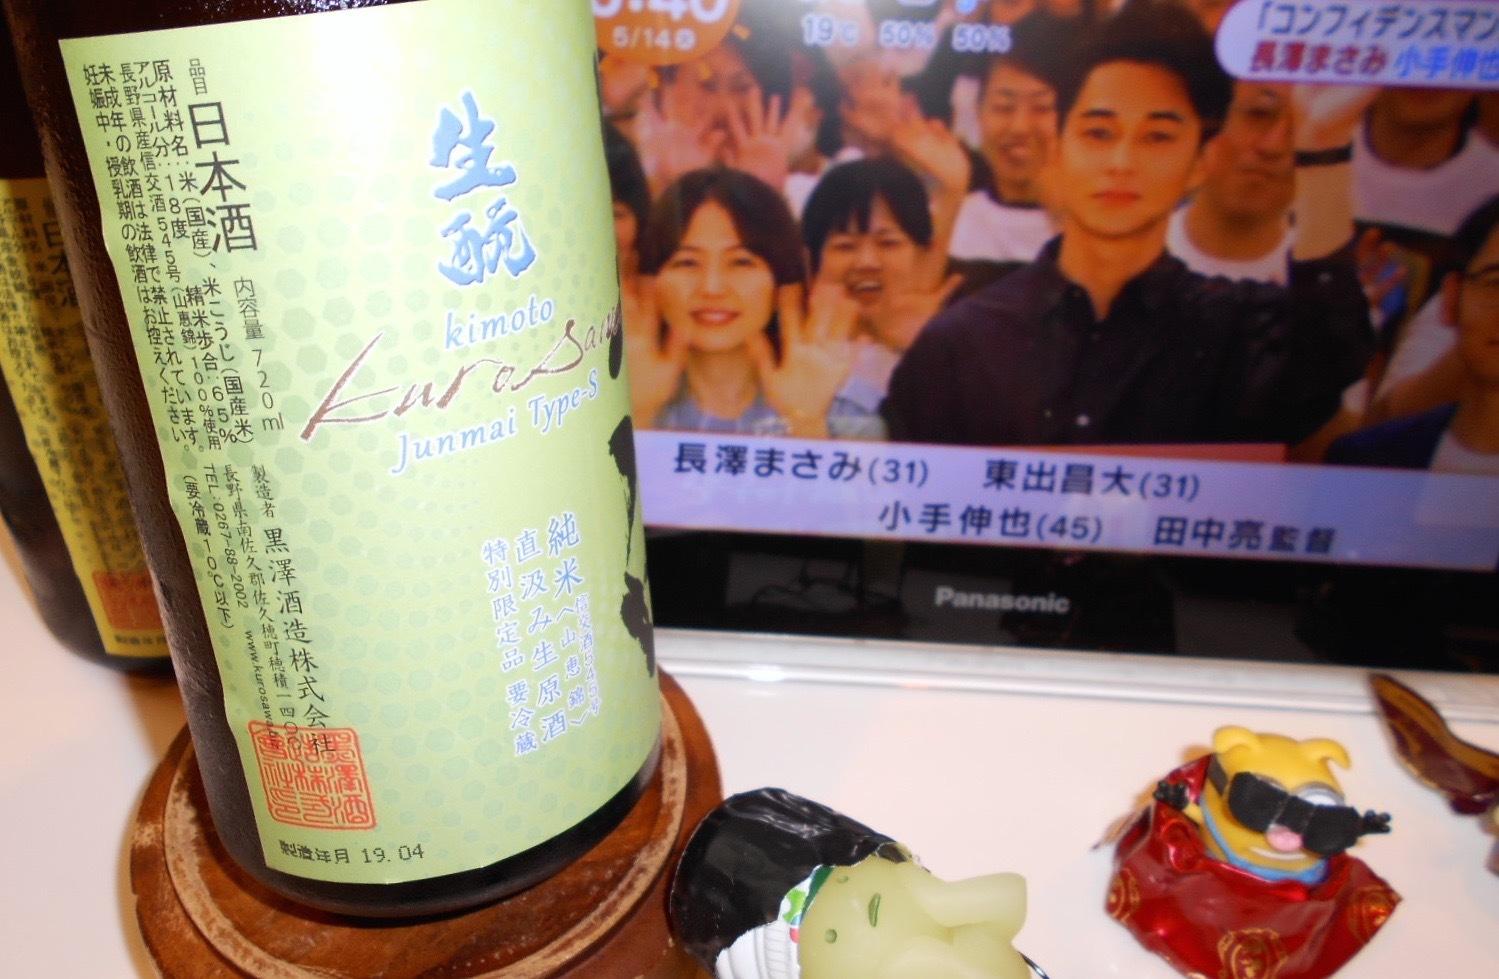 kurosawa_type-s30by1_2.jpg